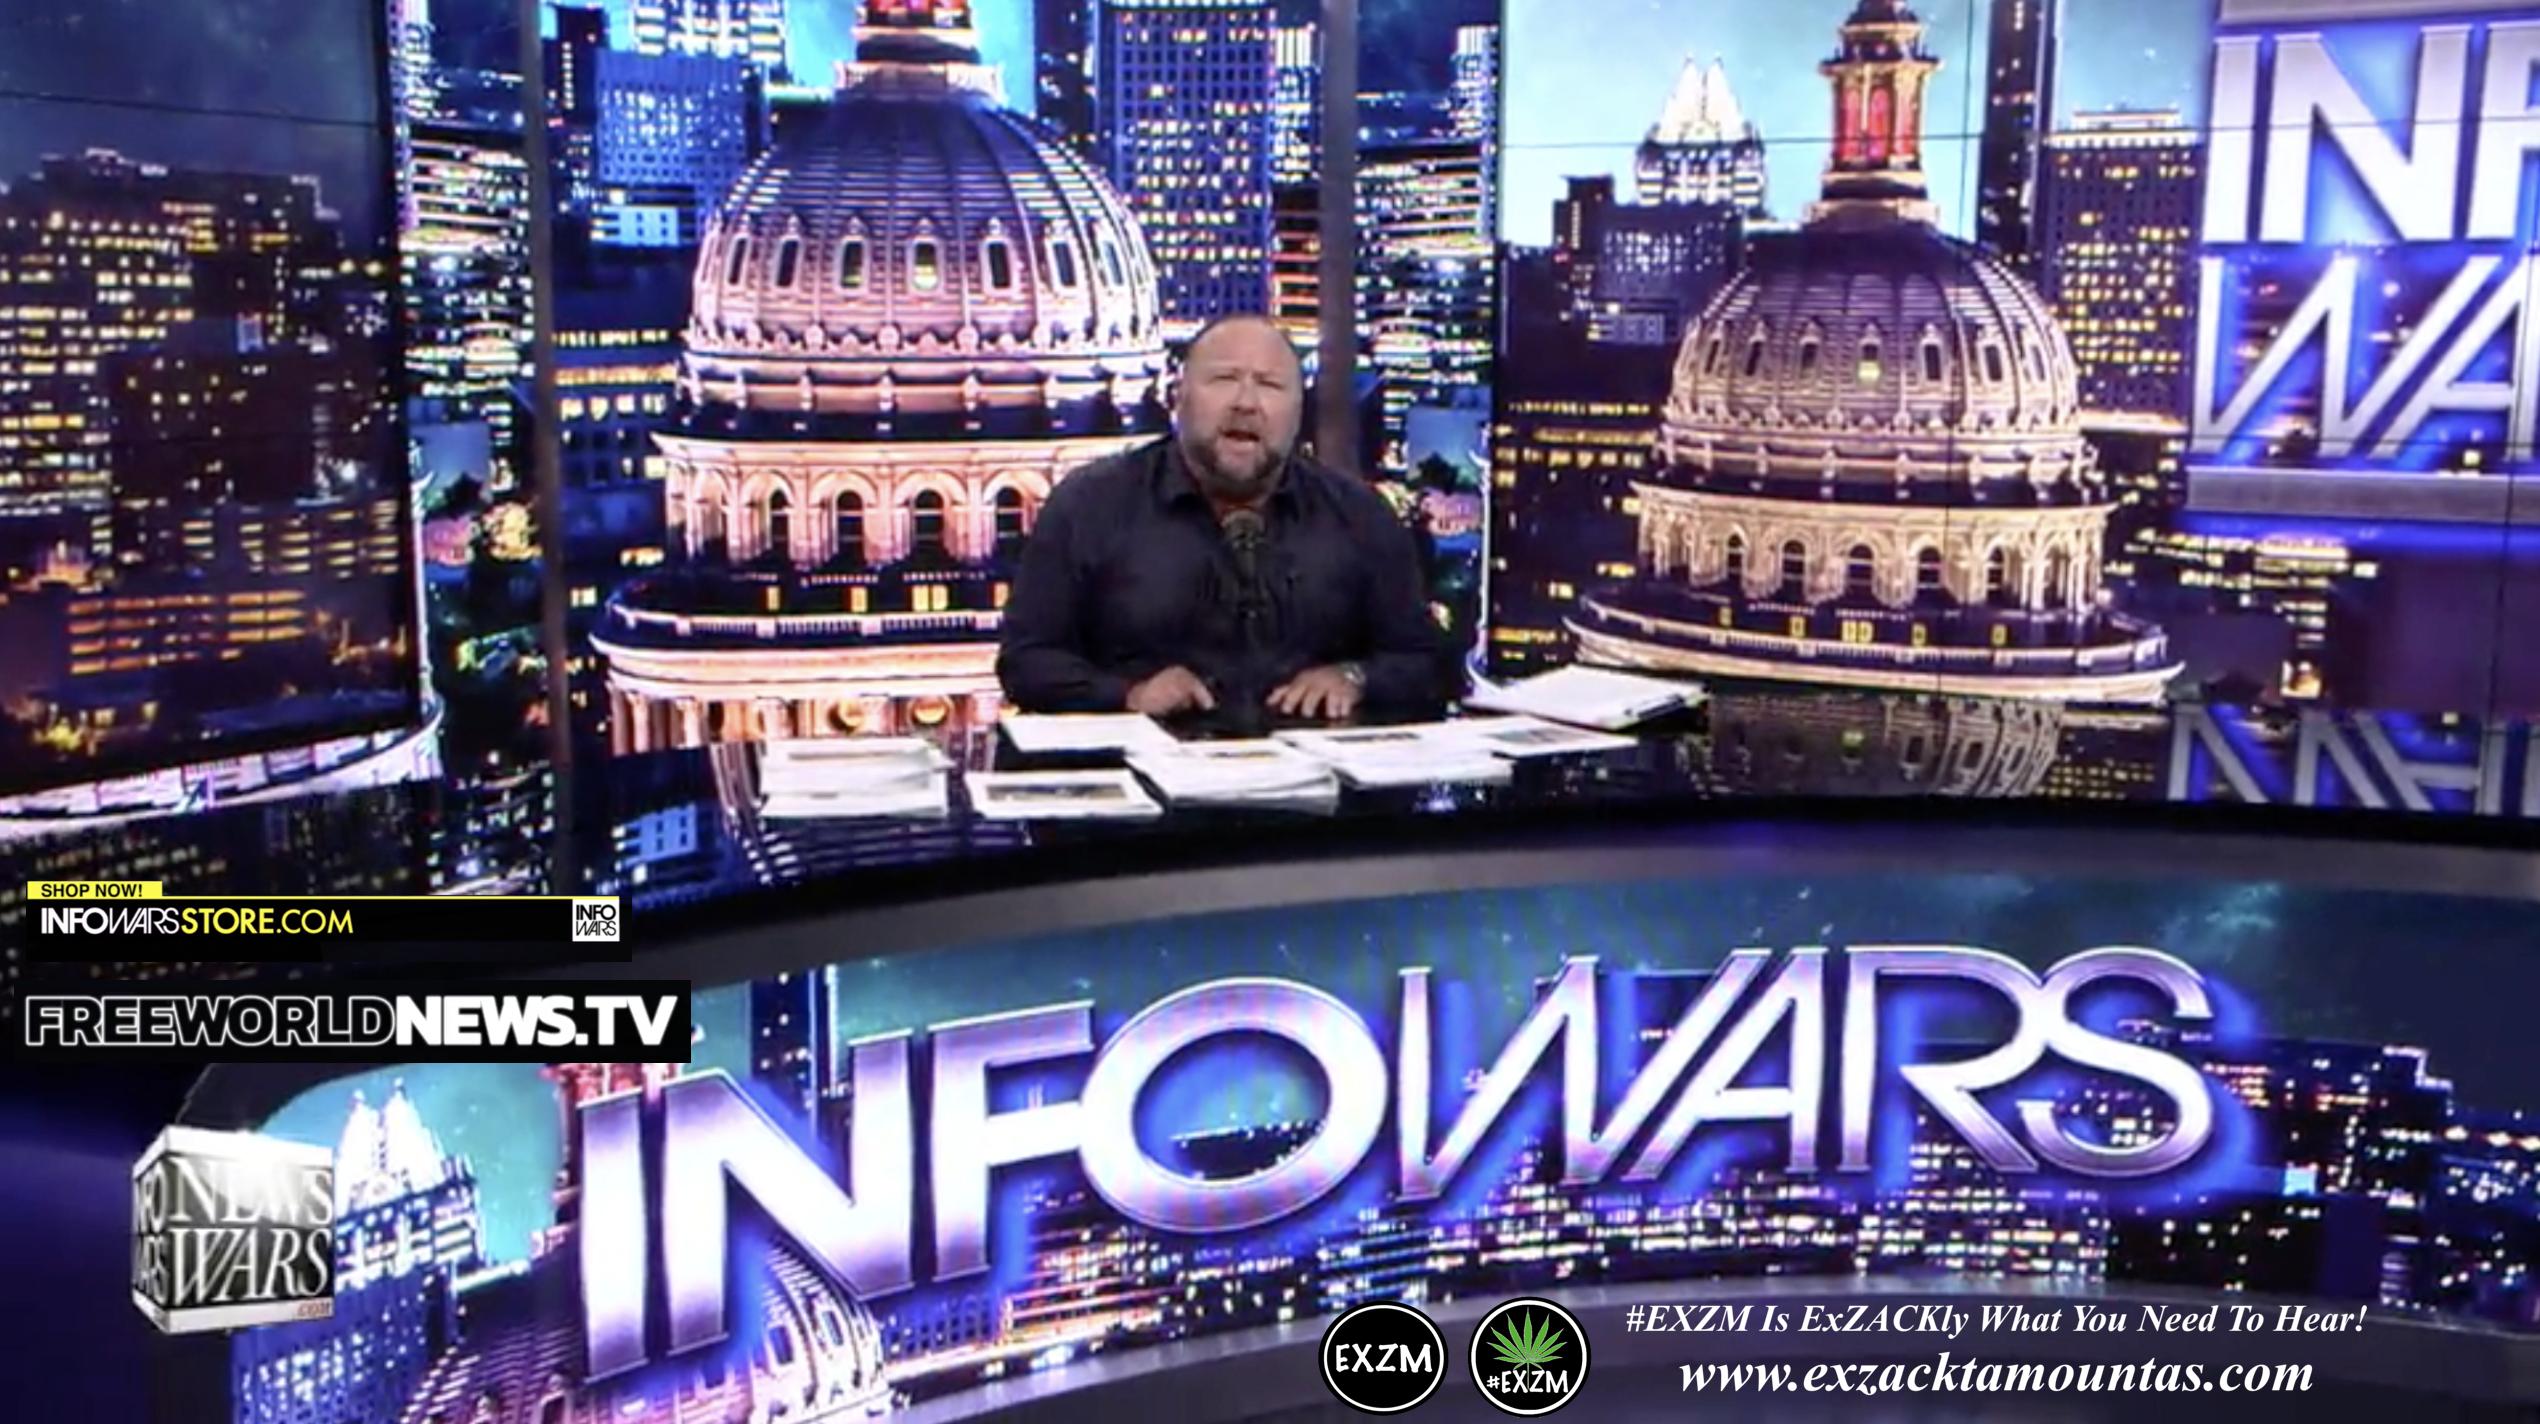 Alex Jones Live In Infowars Studio Free World News TV EXZM Zack Mount August 20th 2021 copy